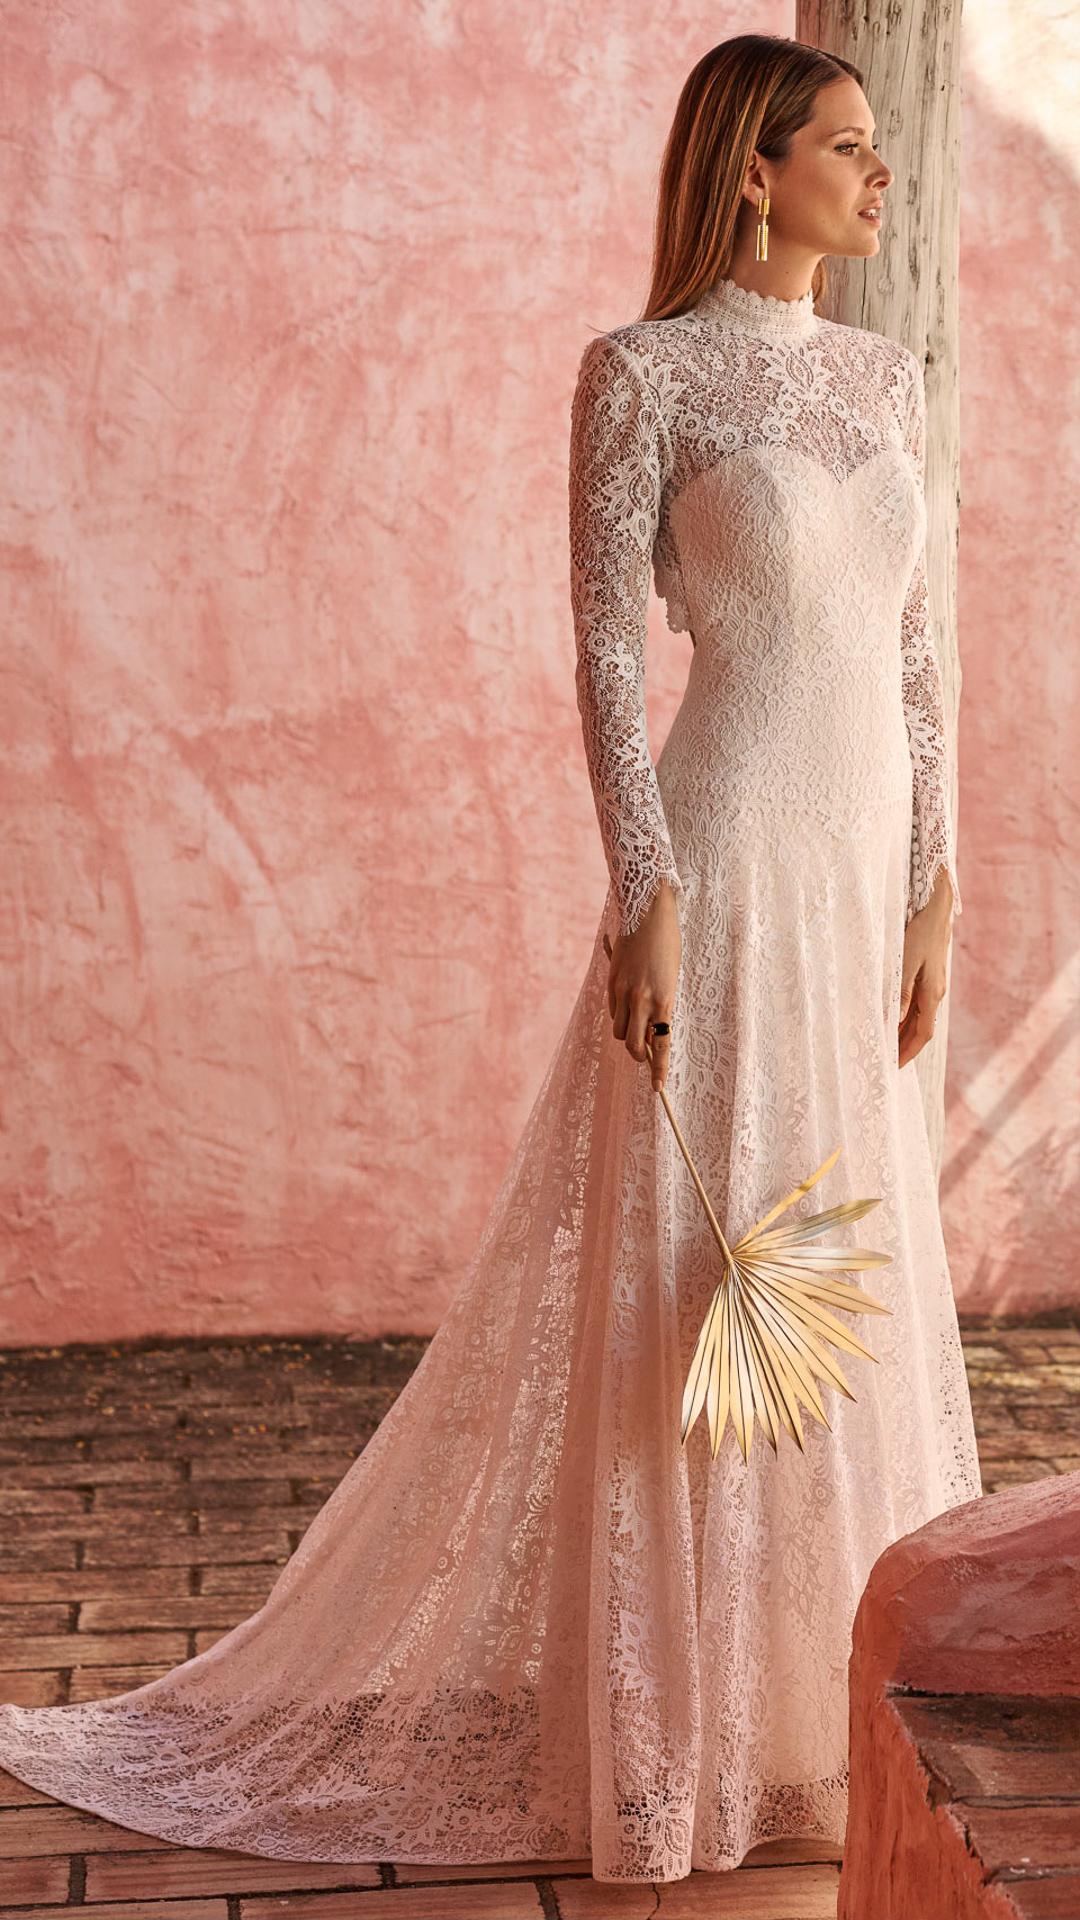 Vanilla Sky - Marylise Brautkleider 2020